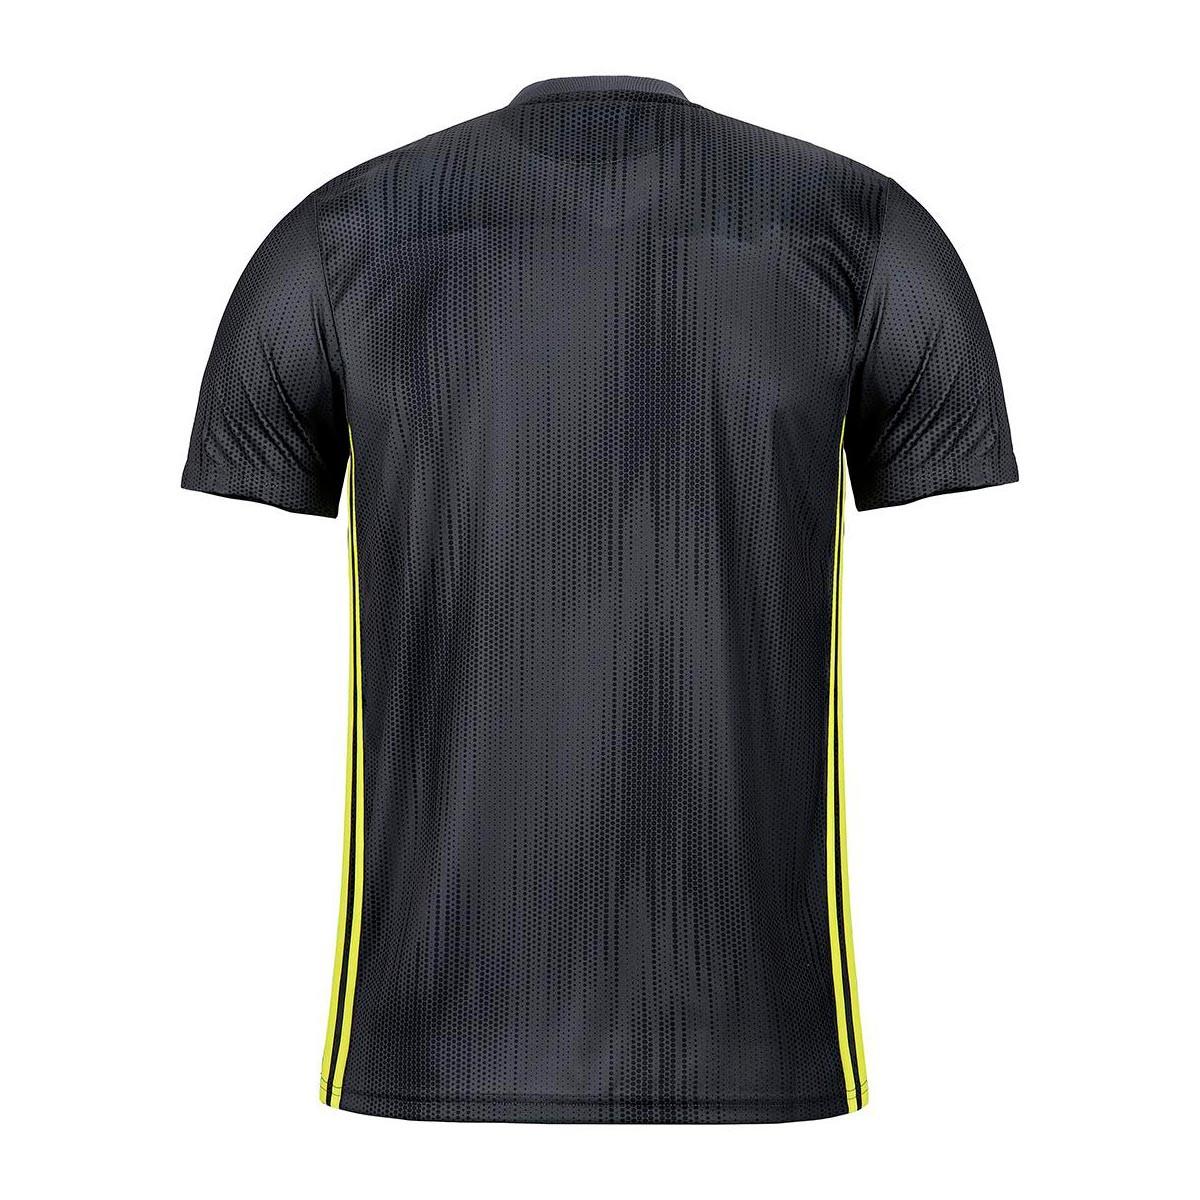 Camiseta adidas Juventus Tercera Equipación 2018-2019 Niño Carbon ... f063d2b8668ac